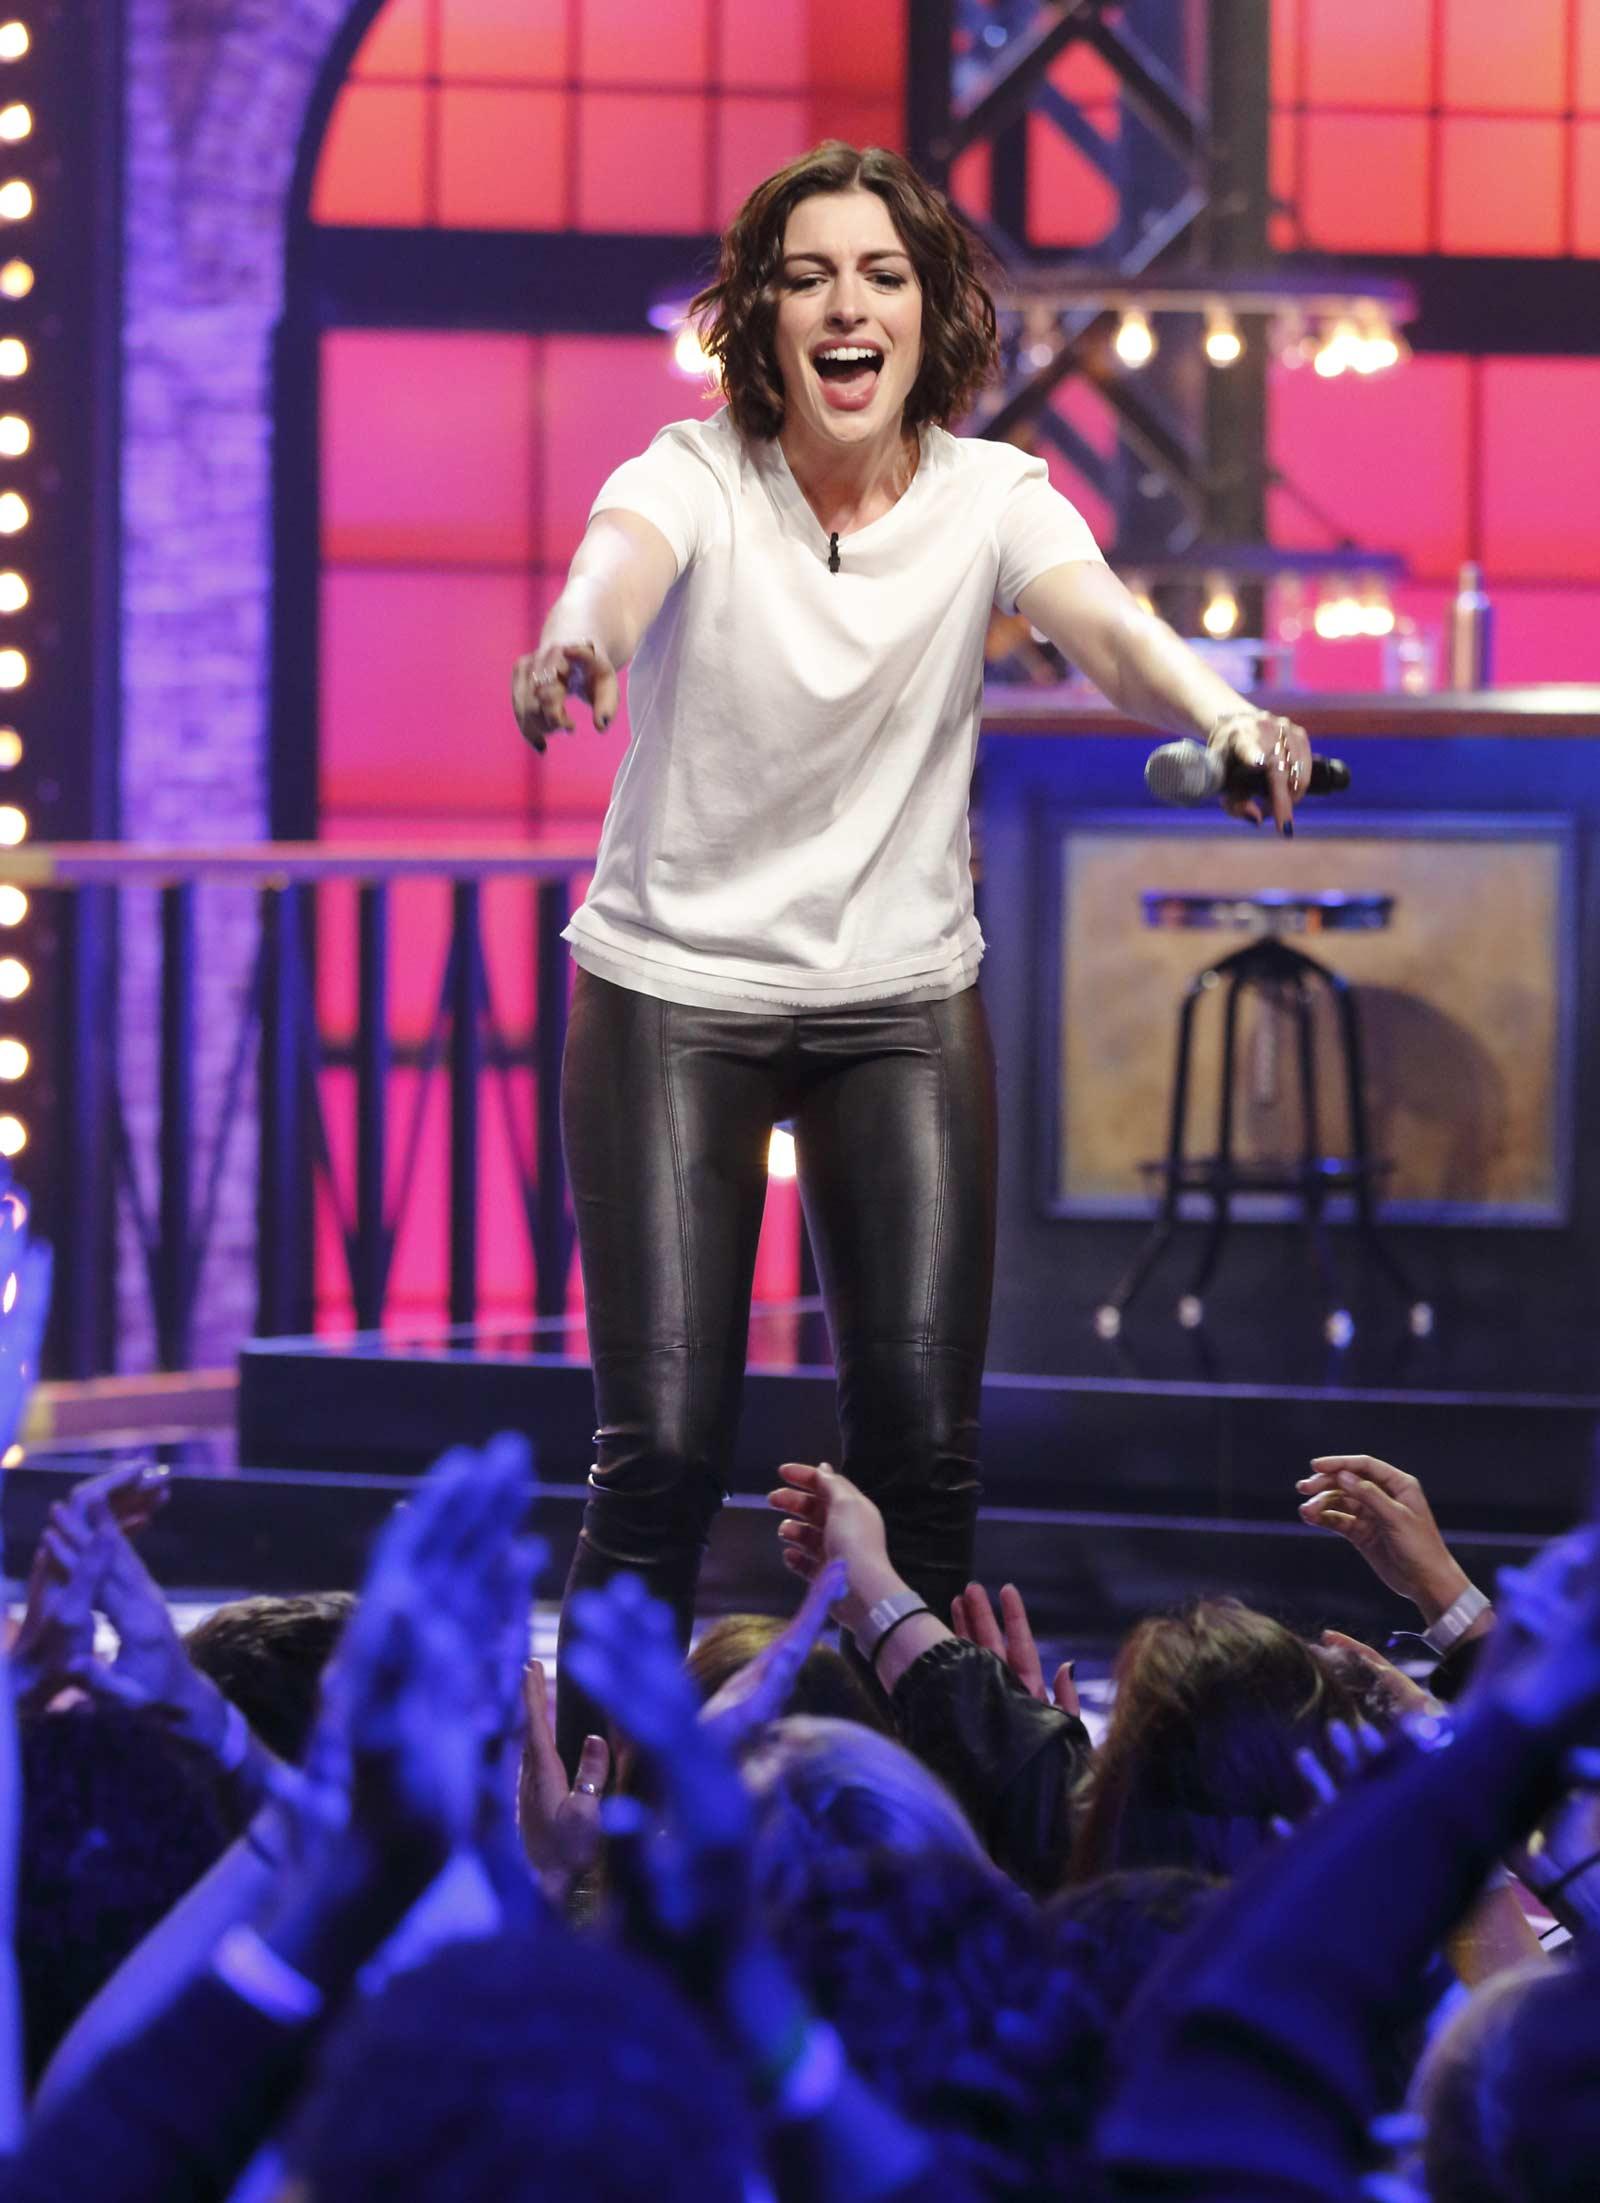 Anne Hathaway at Lip Sync Battle